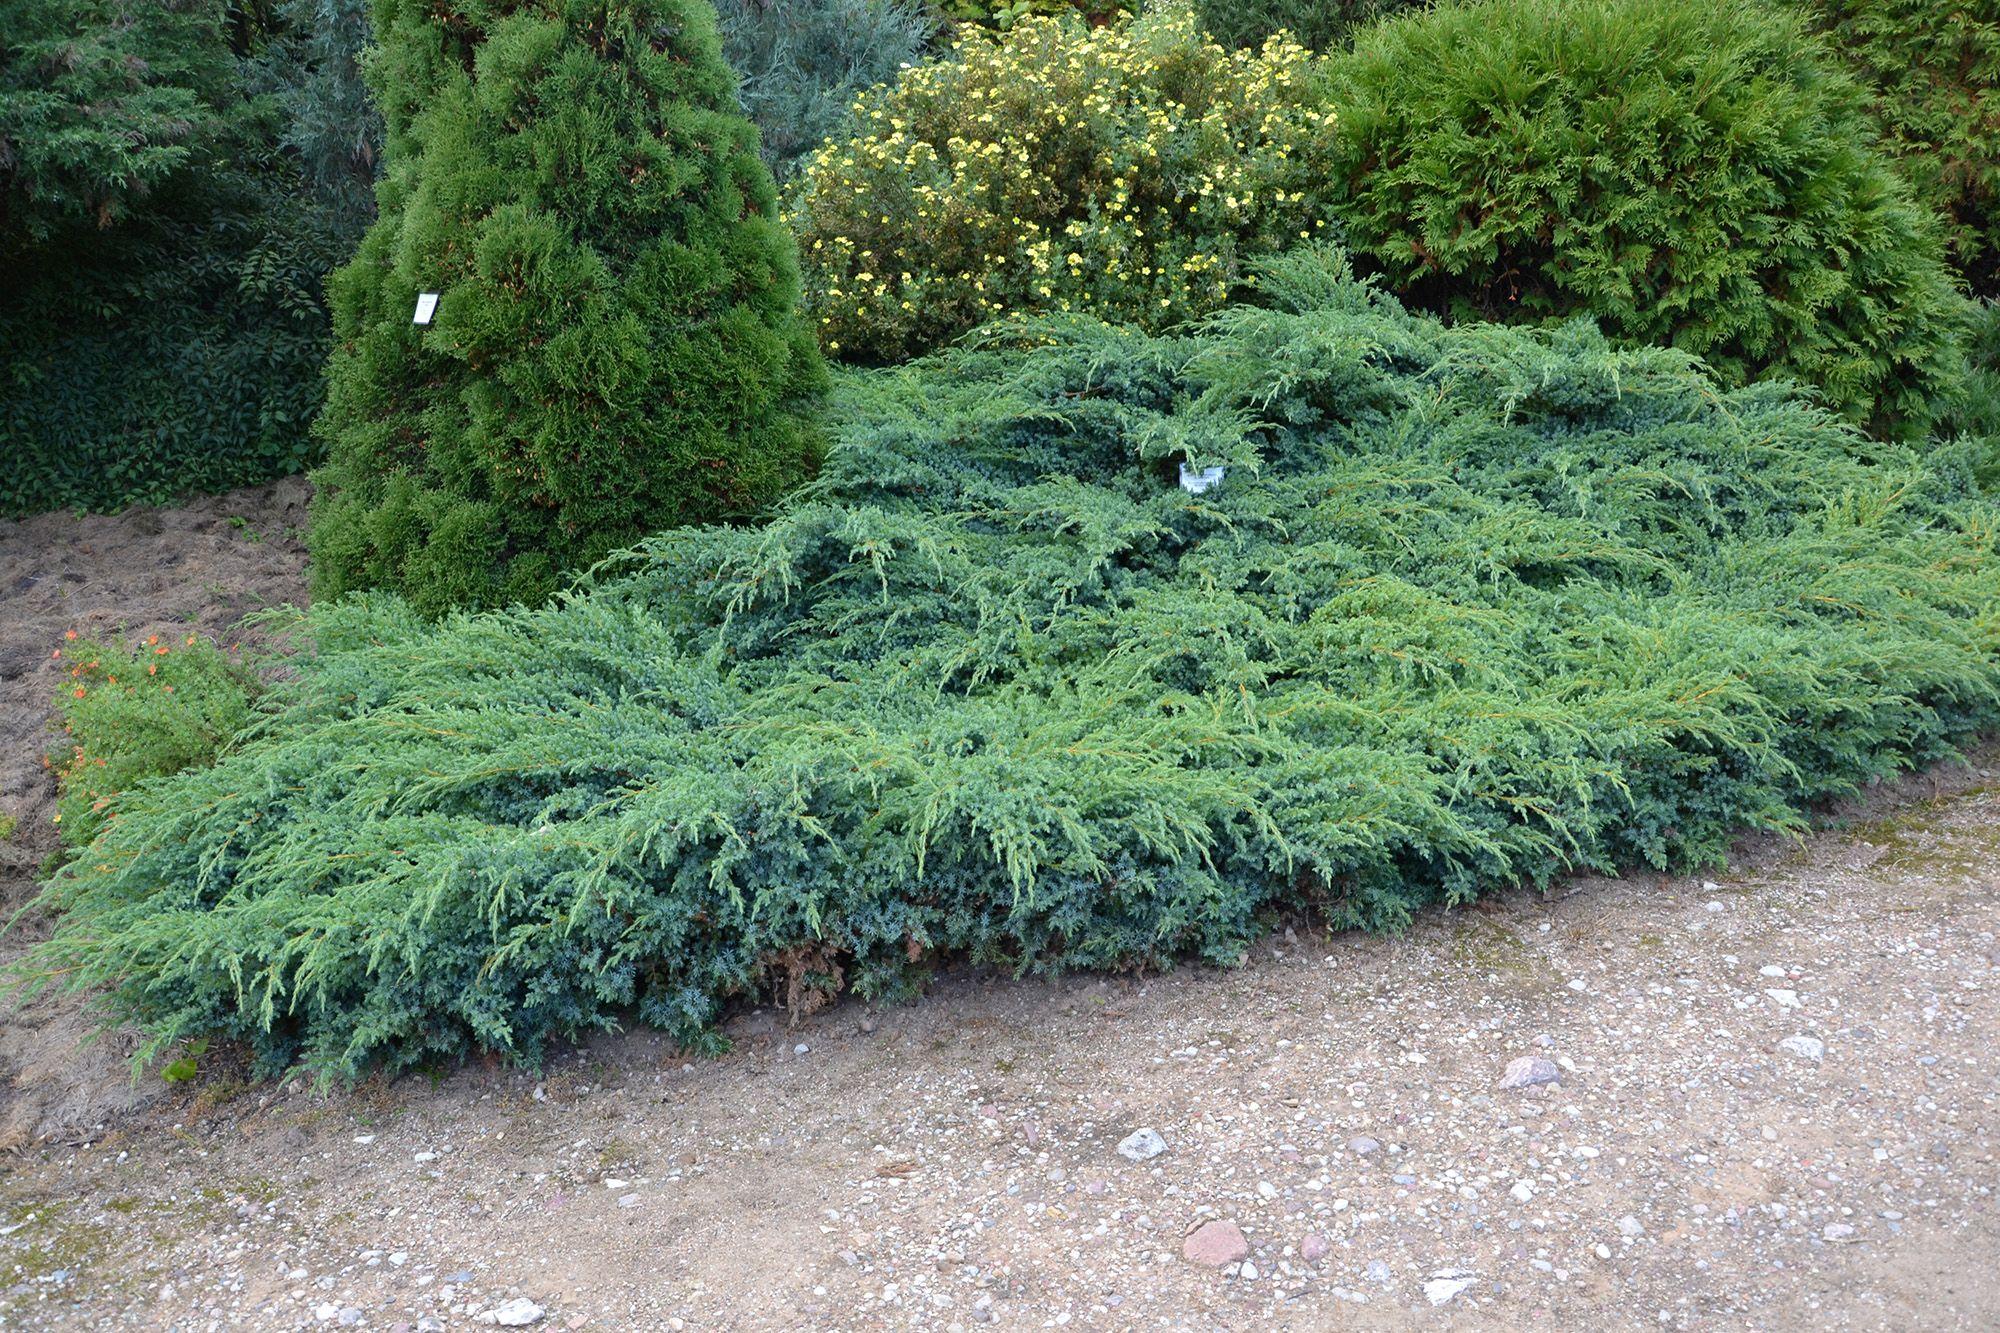 Juniperus squamata blue carpet kert gy pinterest juniperus squamata blue carpet and carpet - Juniperus squamata blue carpet ...